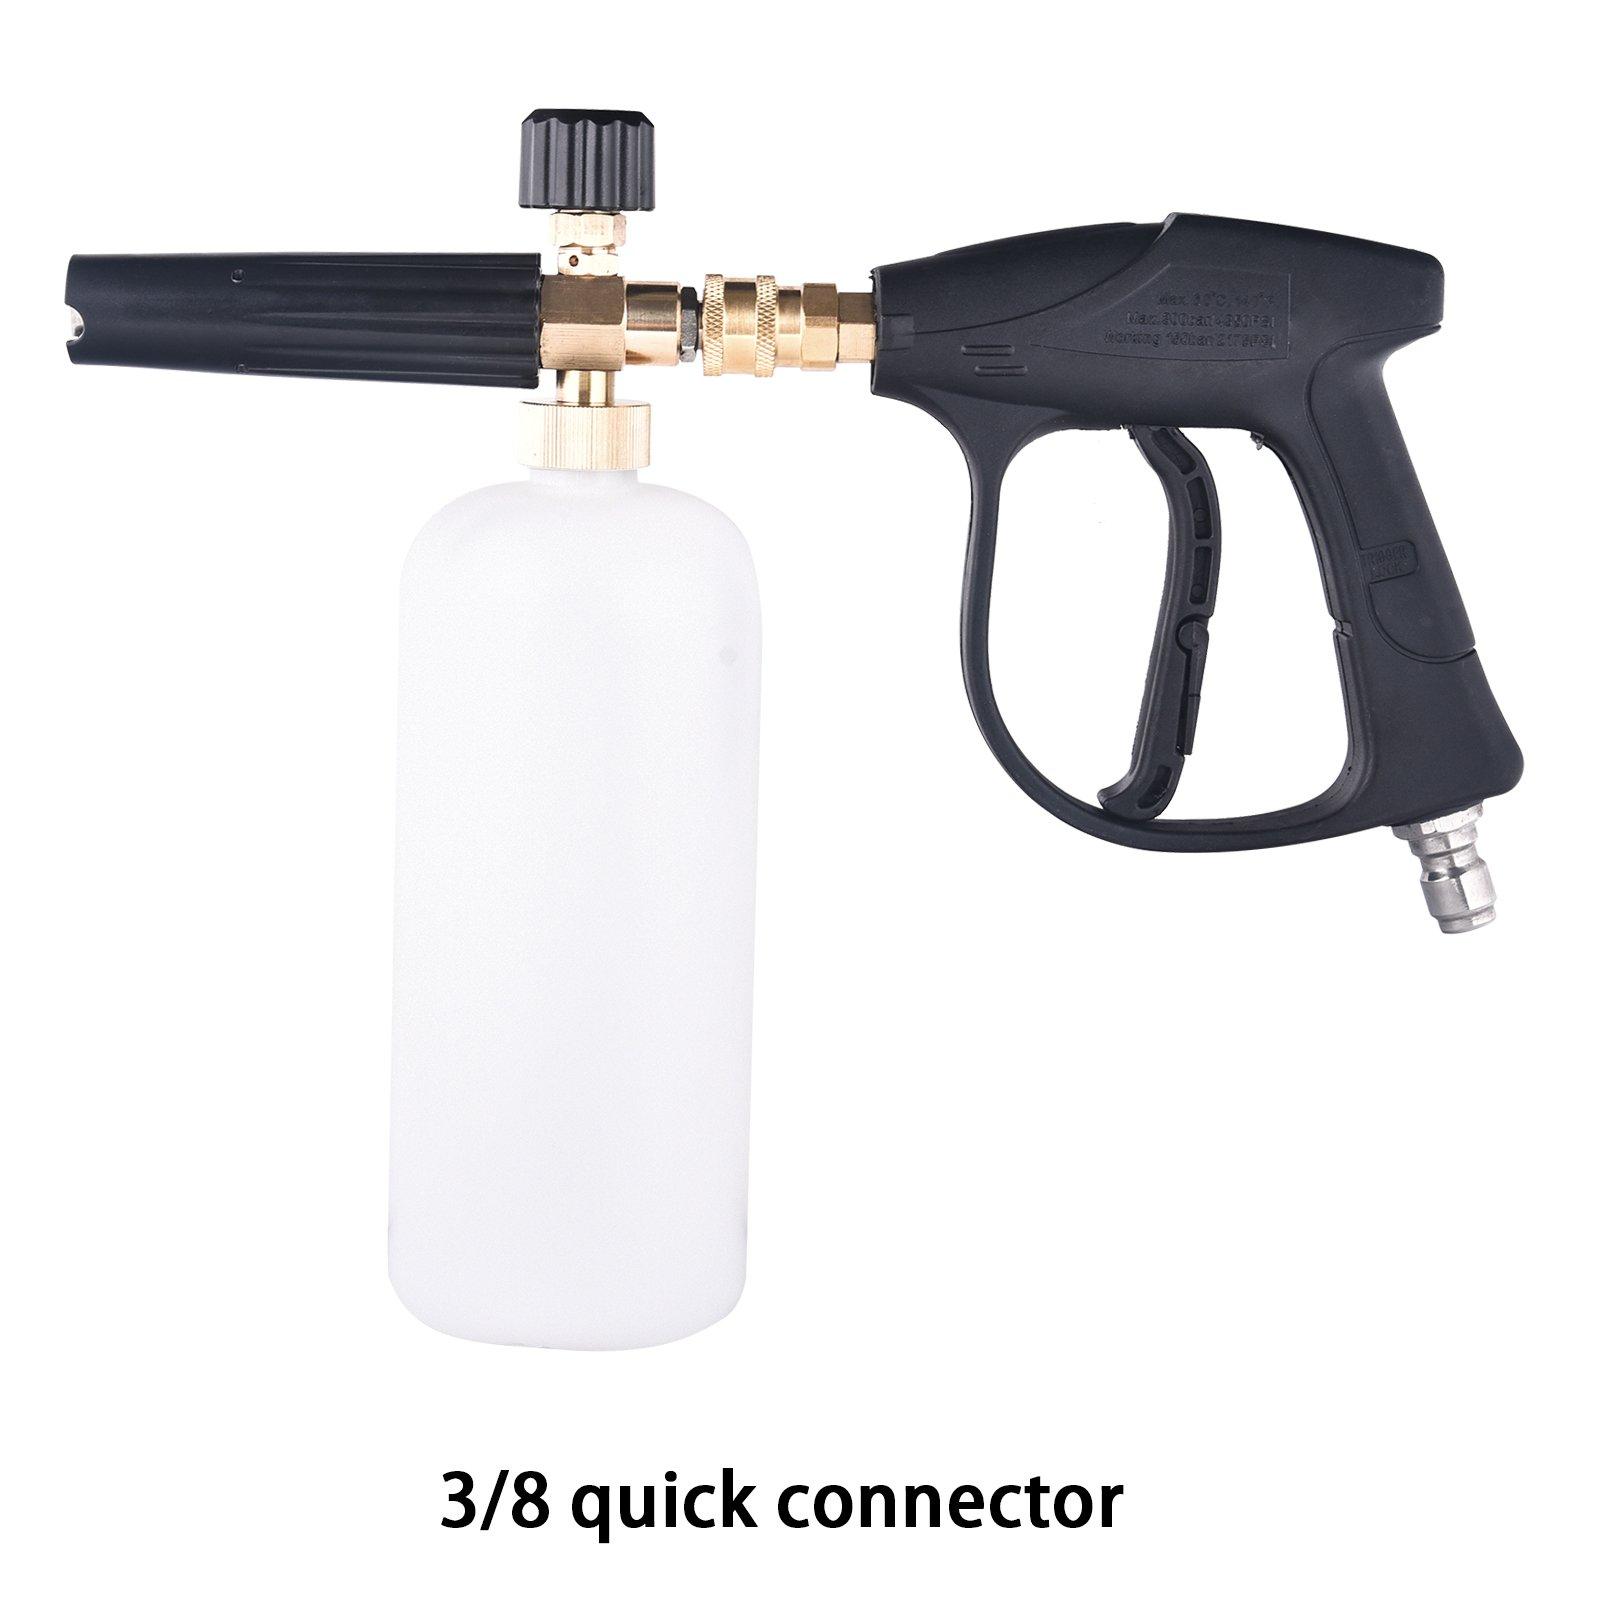 Car-Styling Foam Gun Car Wash Pressure Washer Jet Wash Quick Release Adjustable Snow Foam Lance Foam Cannon Tools (3/8 Quick Release)